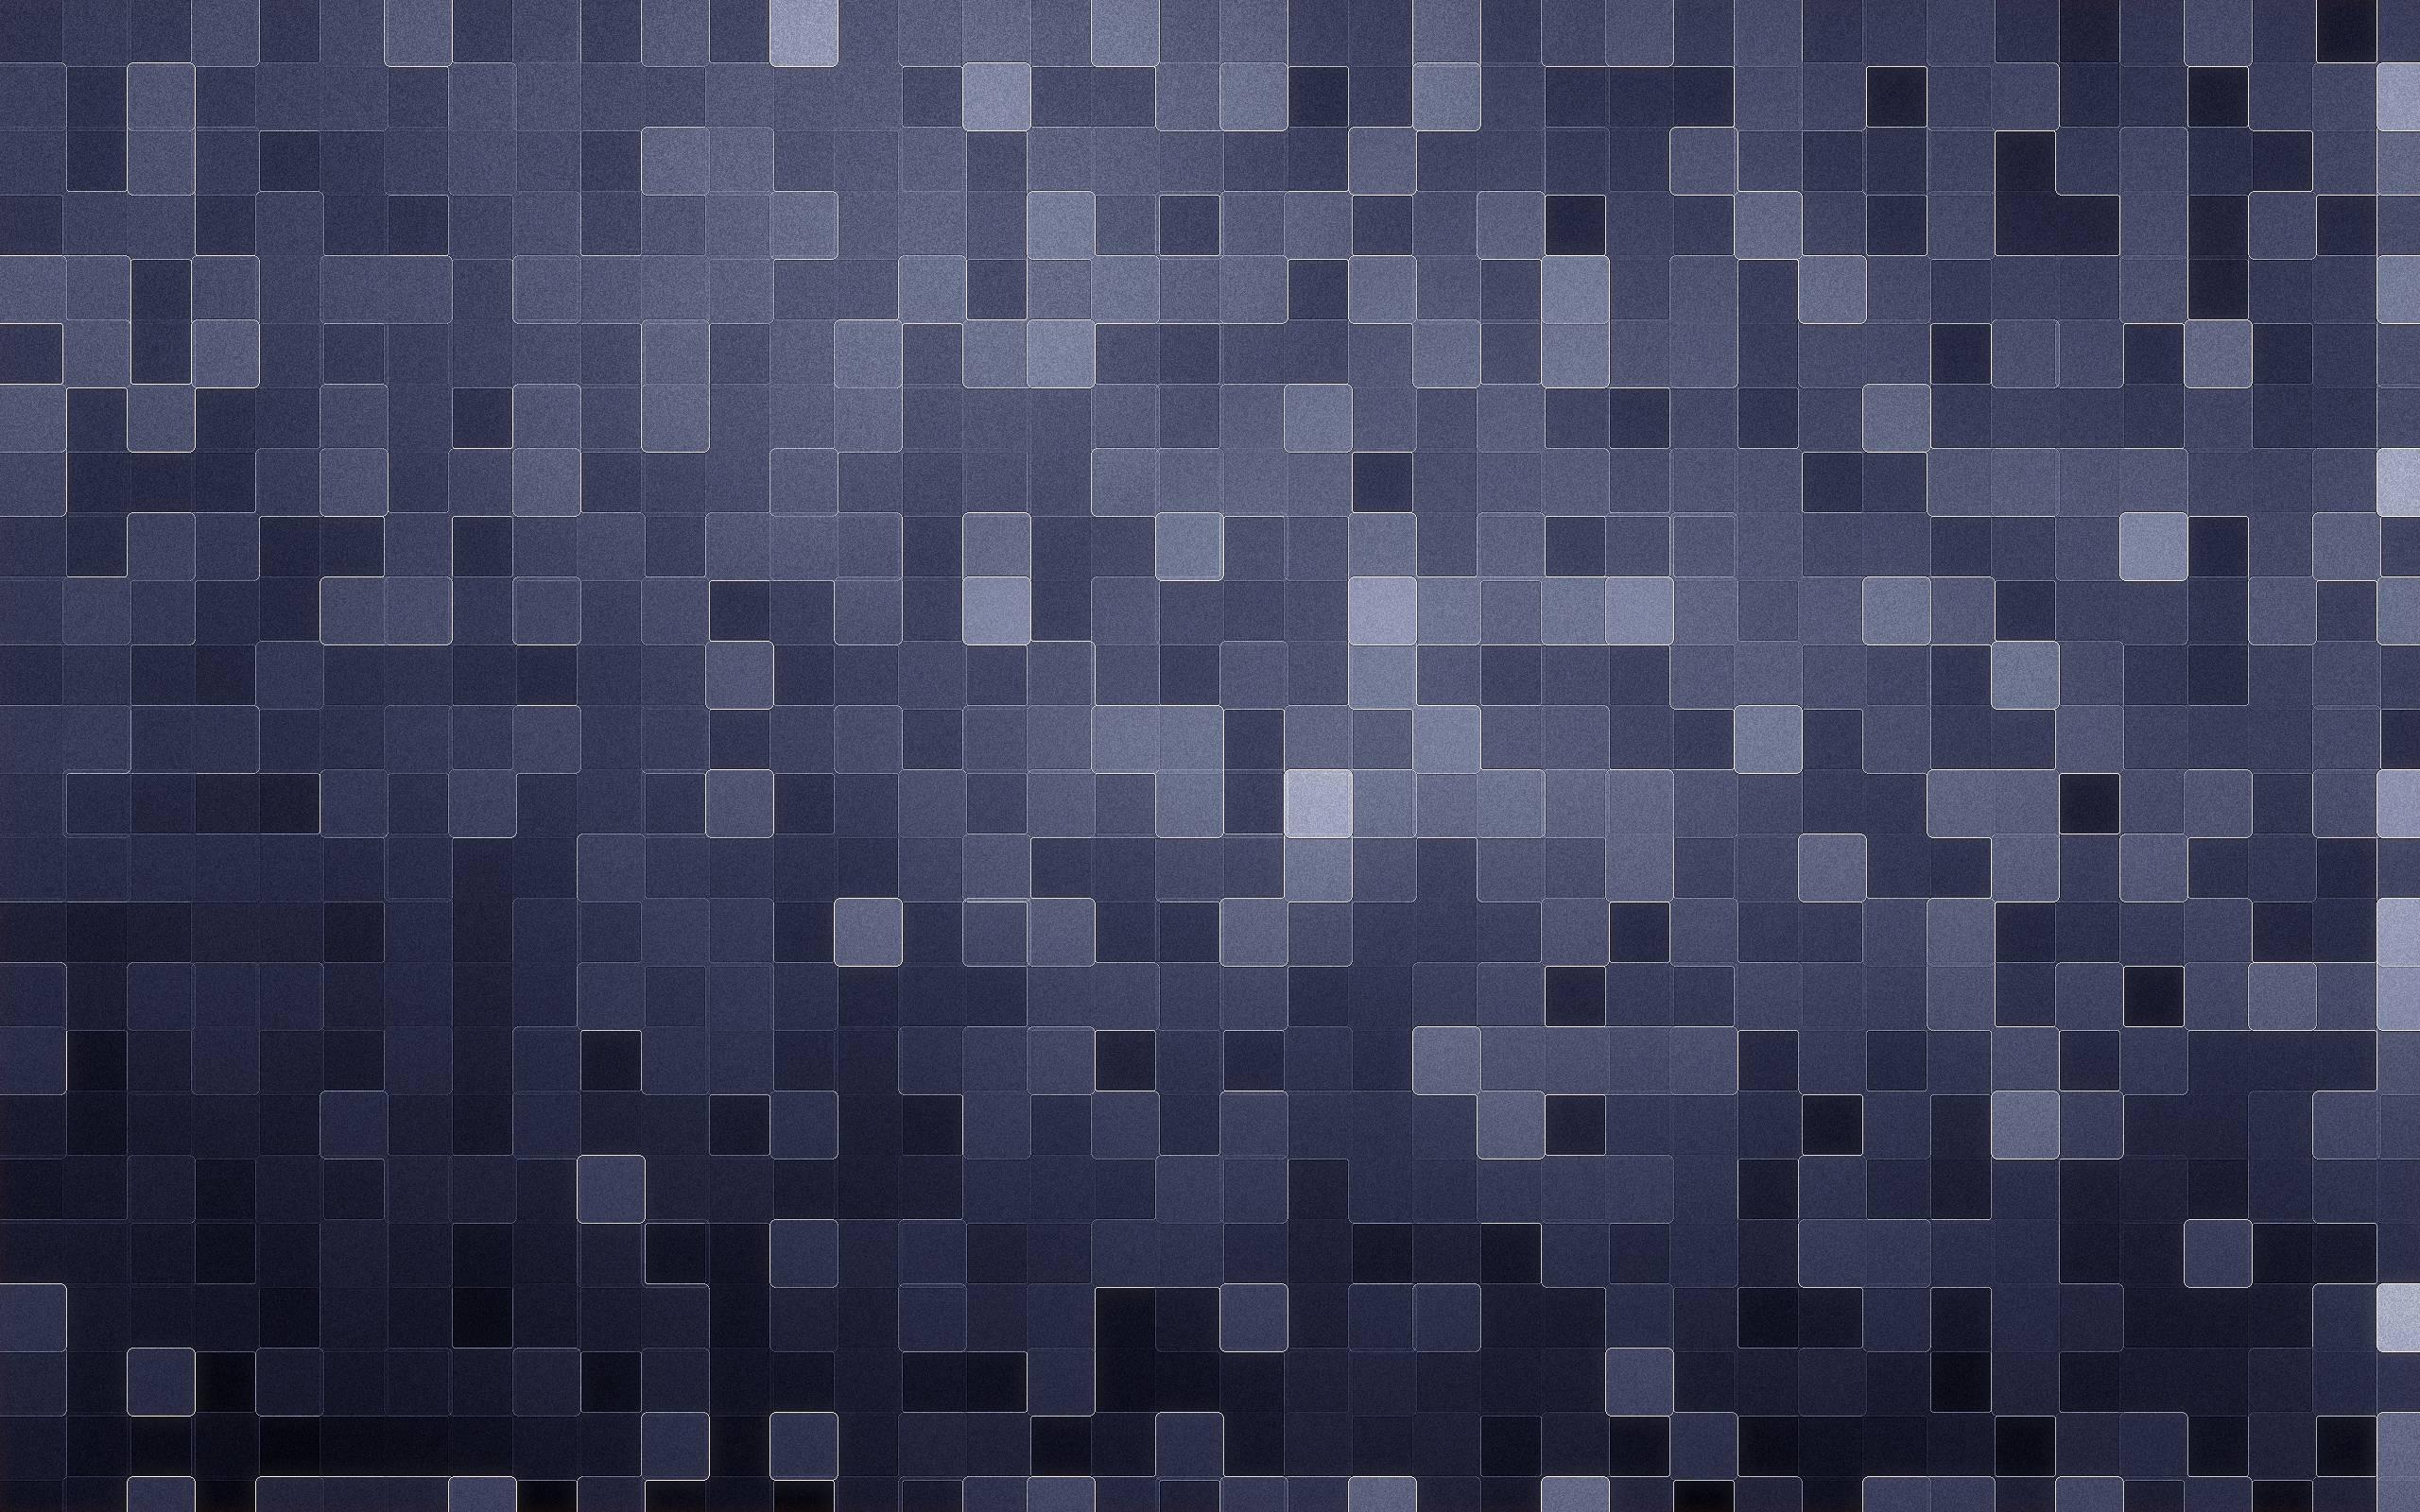 Wallpaper httpiimgurcomRvpBTLpjpg 2560x1600